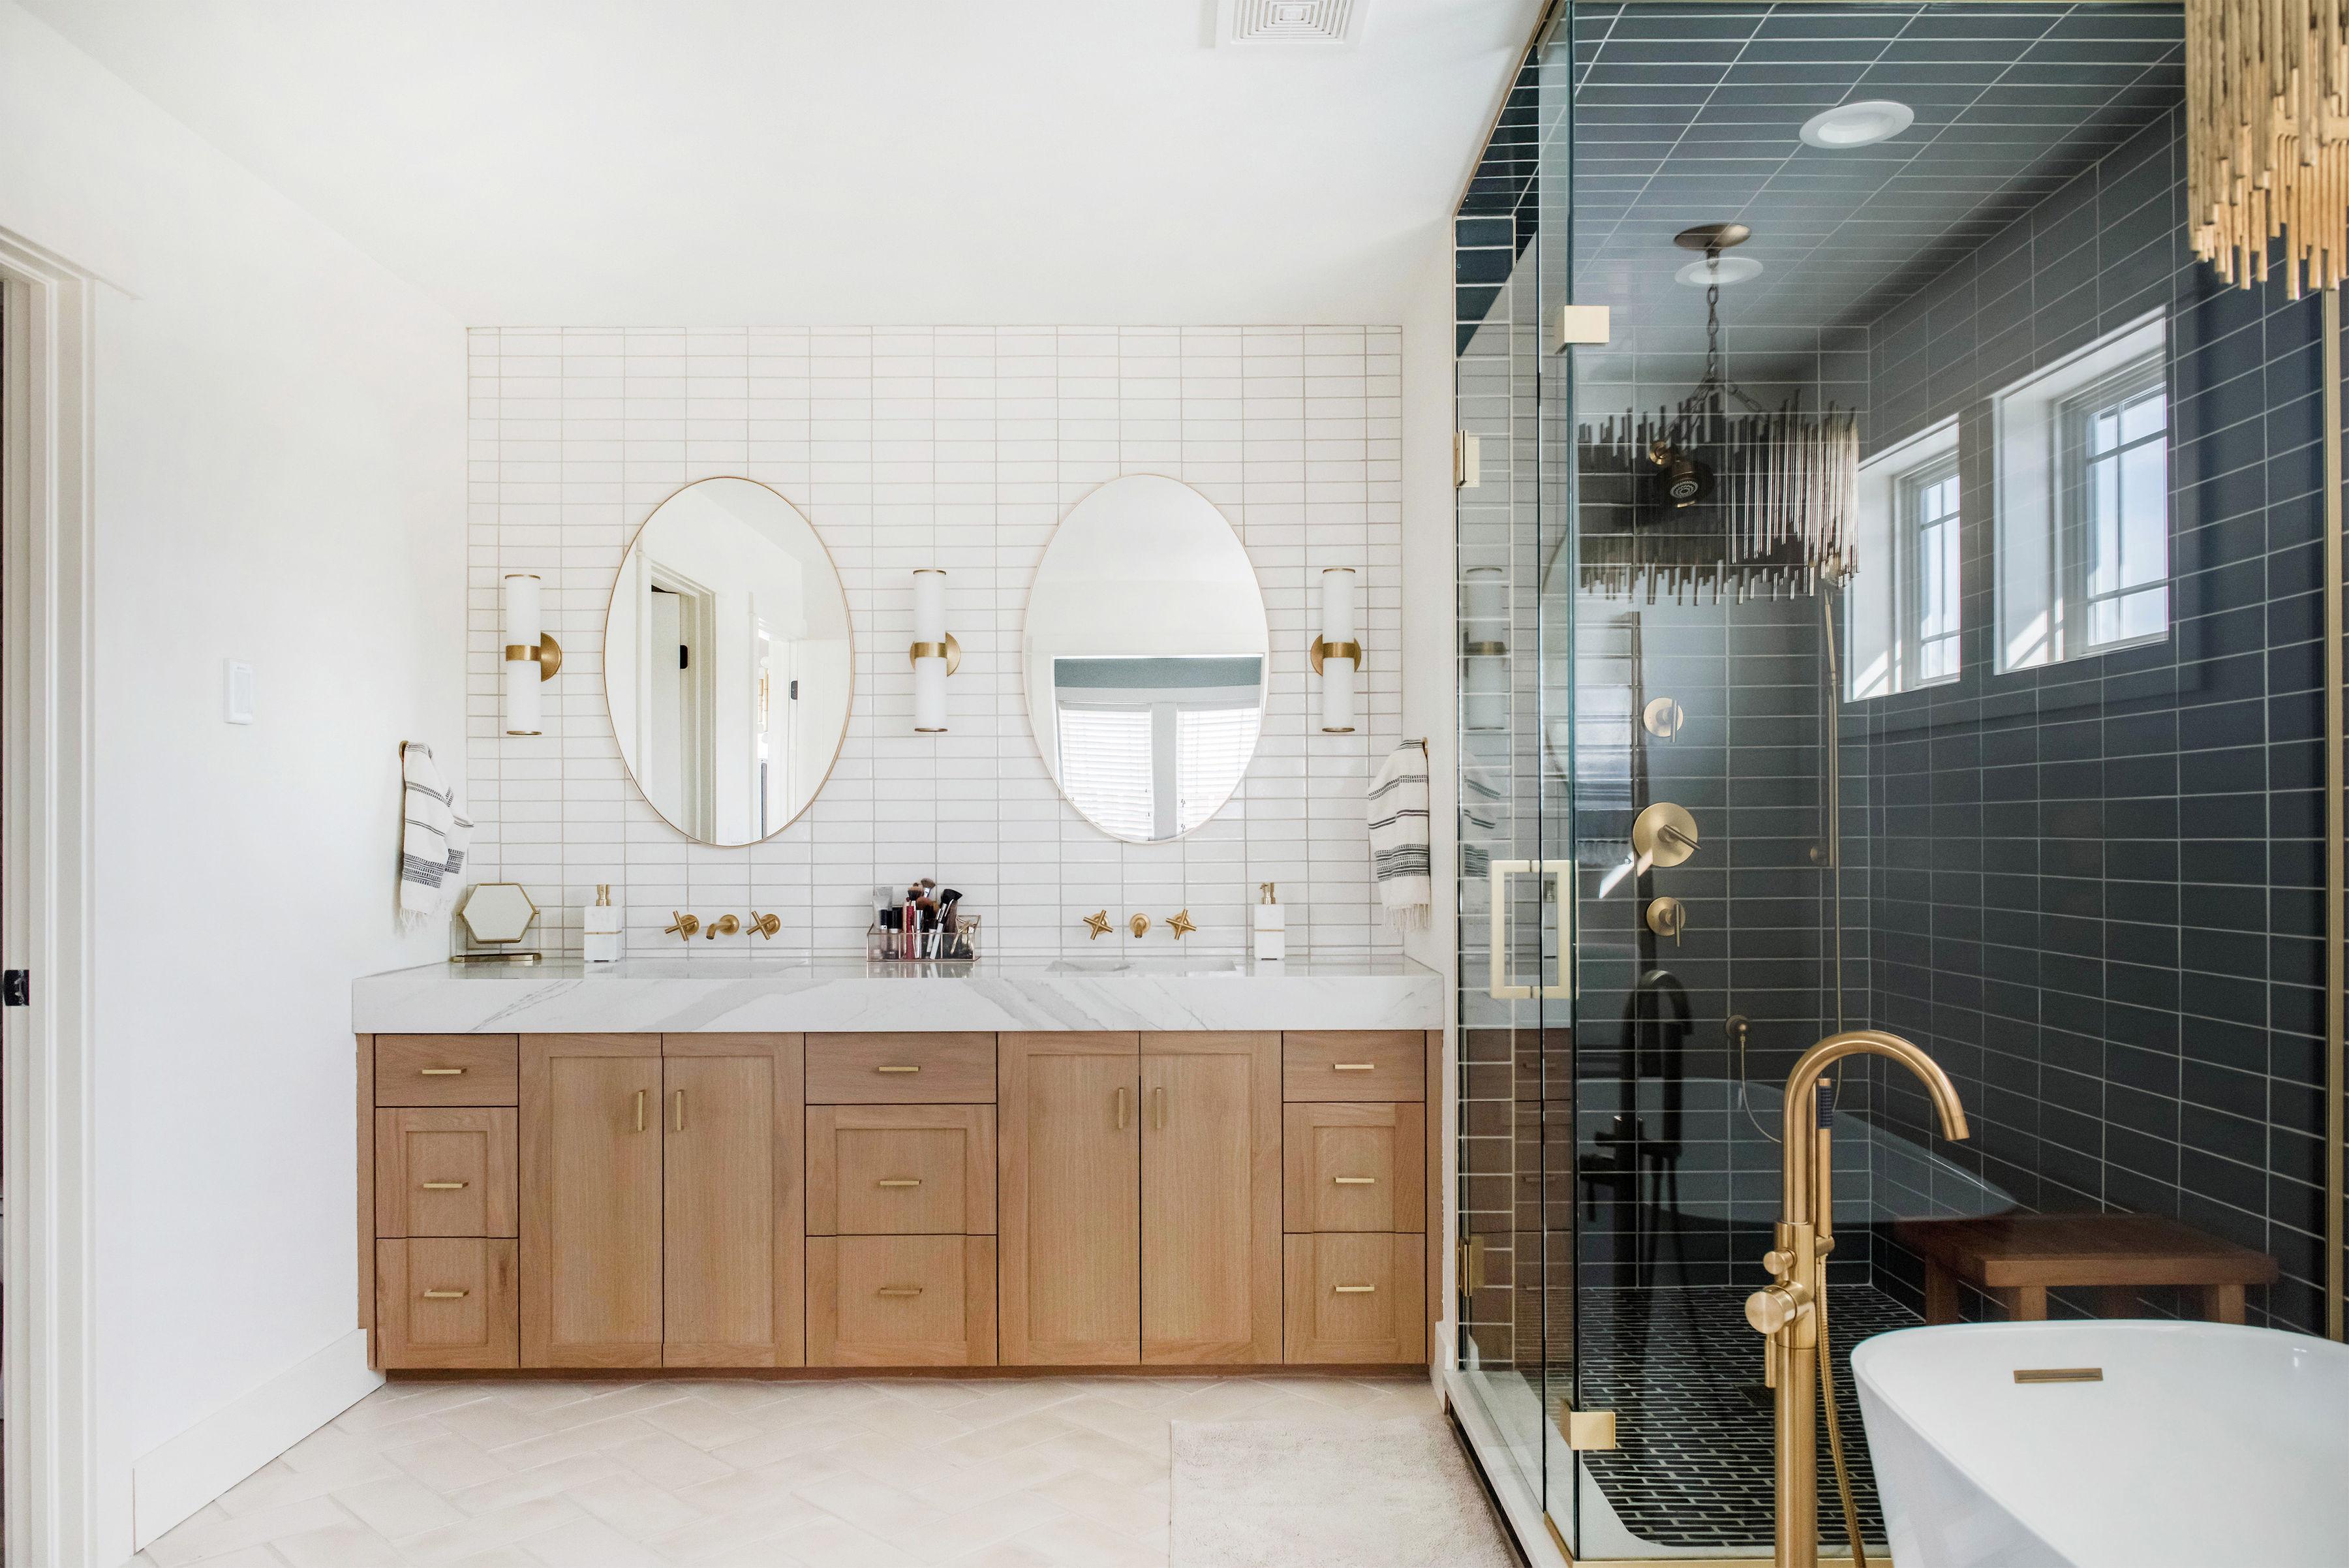 Fireclay San Francisco Showroom Tile - Year of Clean Water